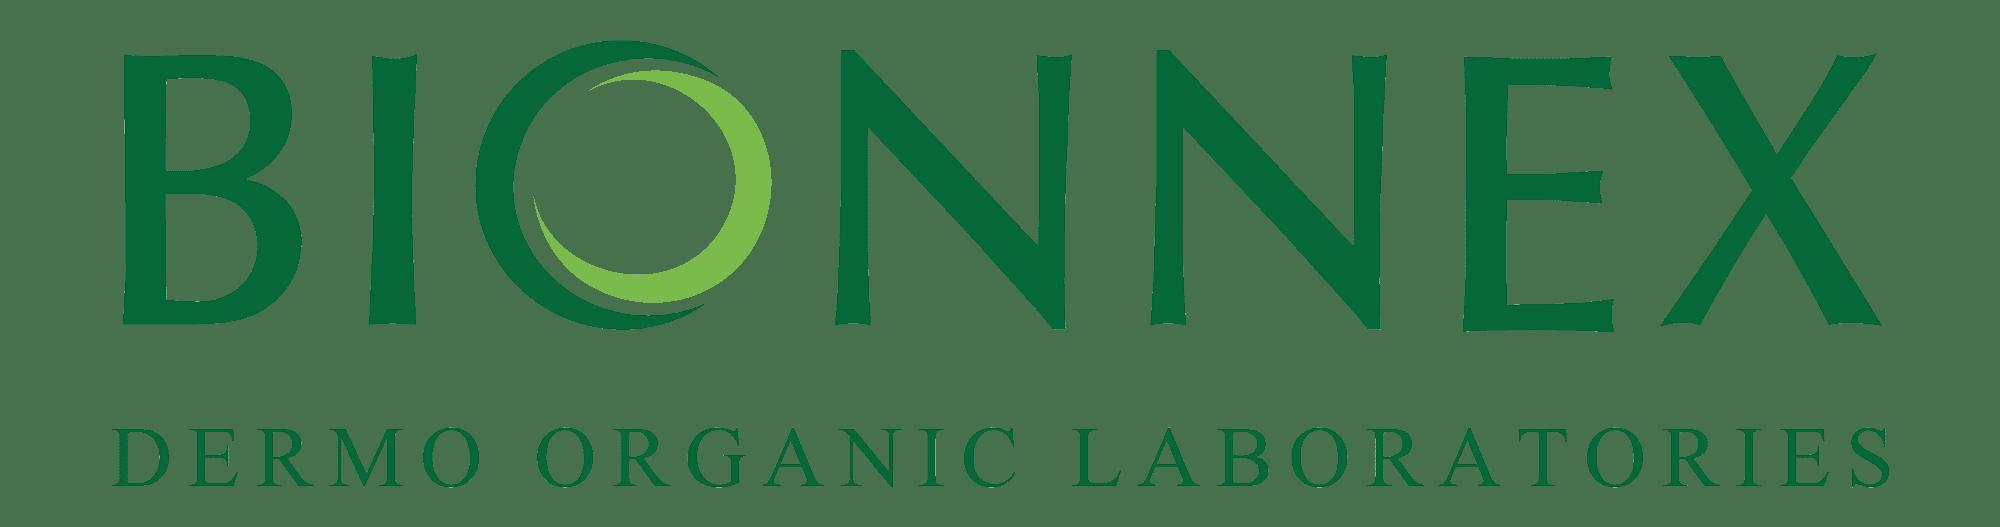 Bionnex